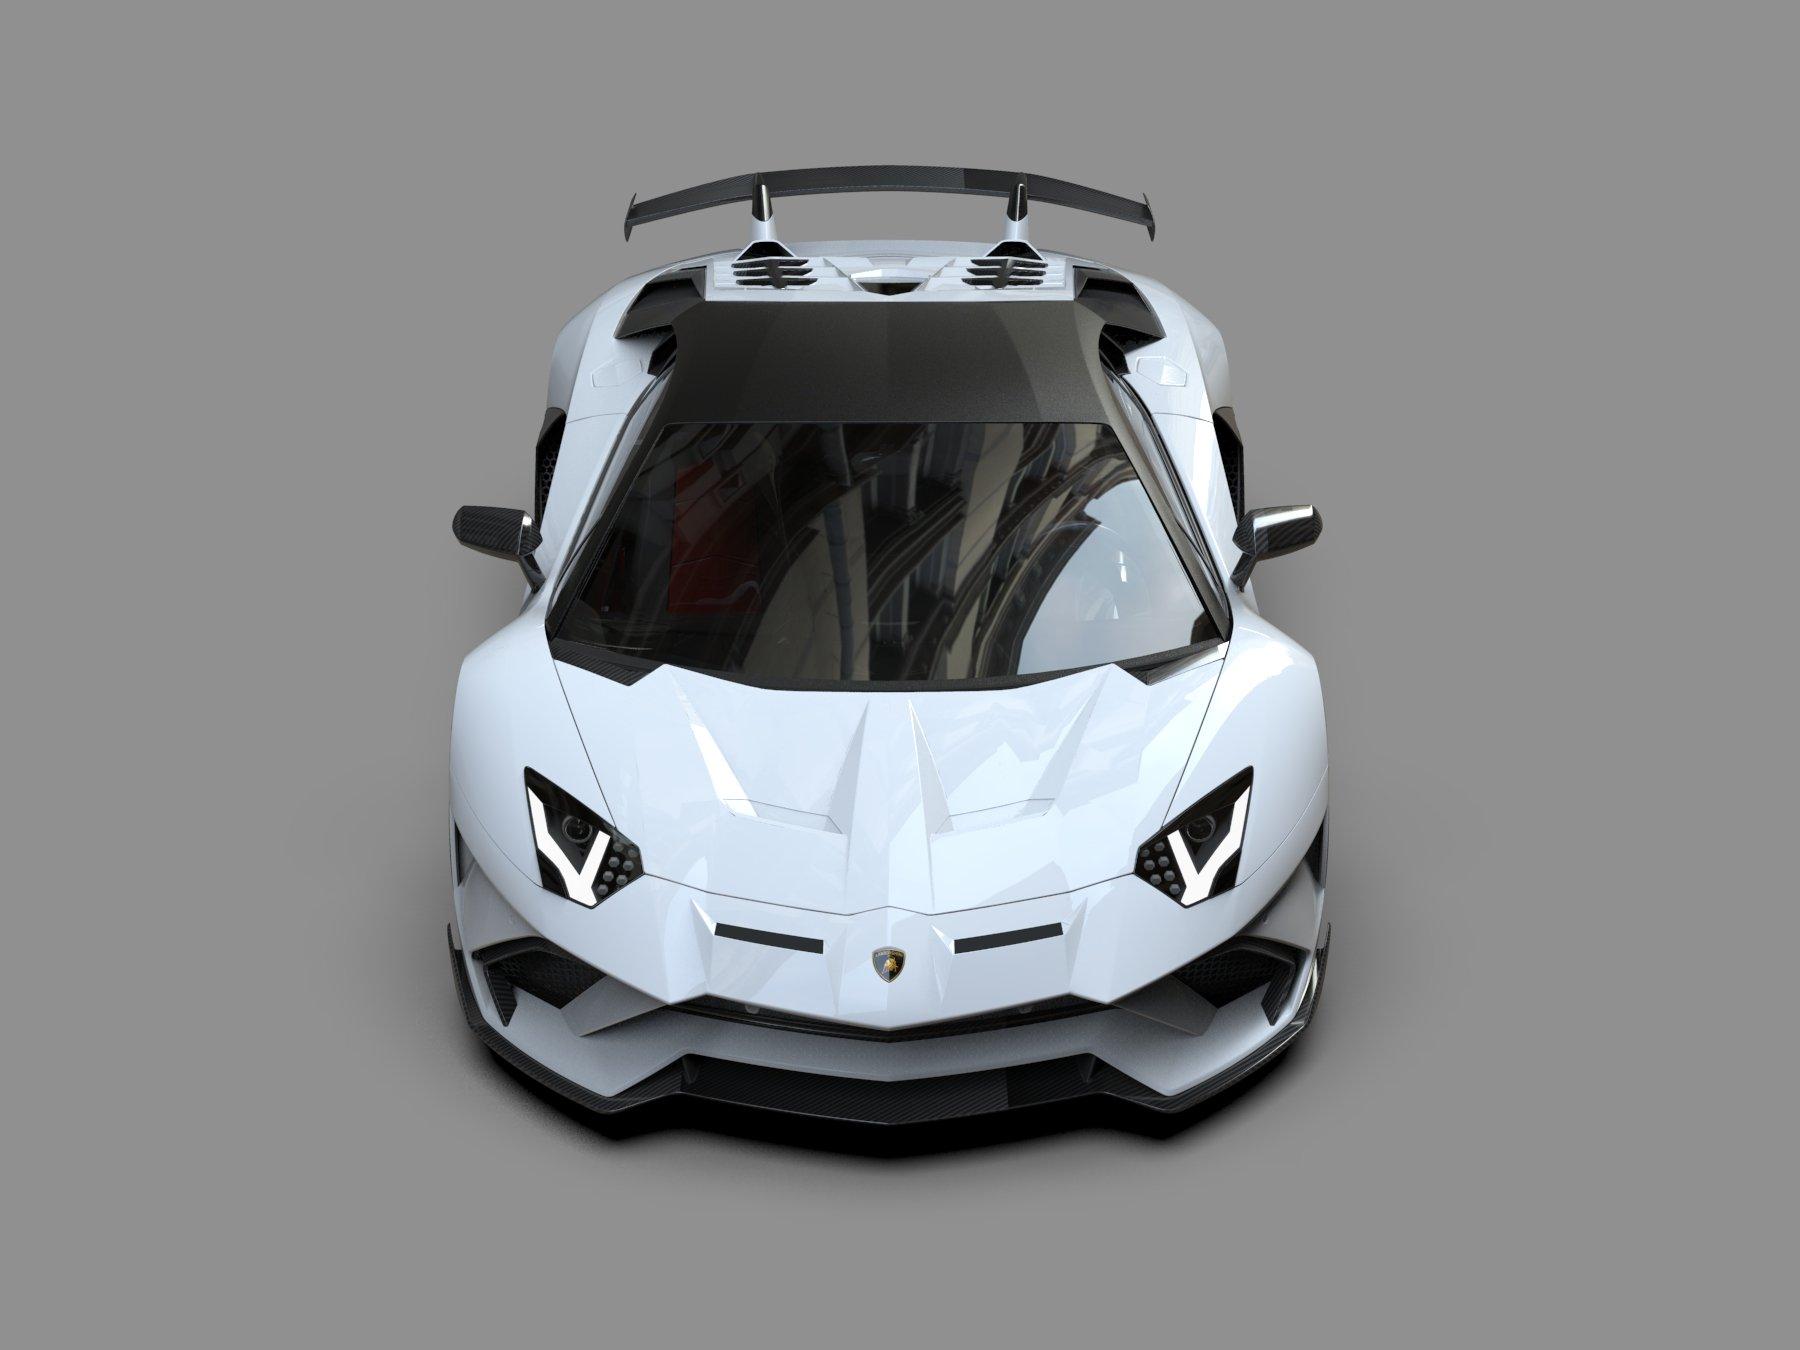 Lamborghini_Aventador_by_Duke_Dynamics_0020